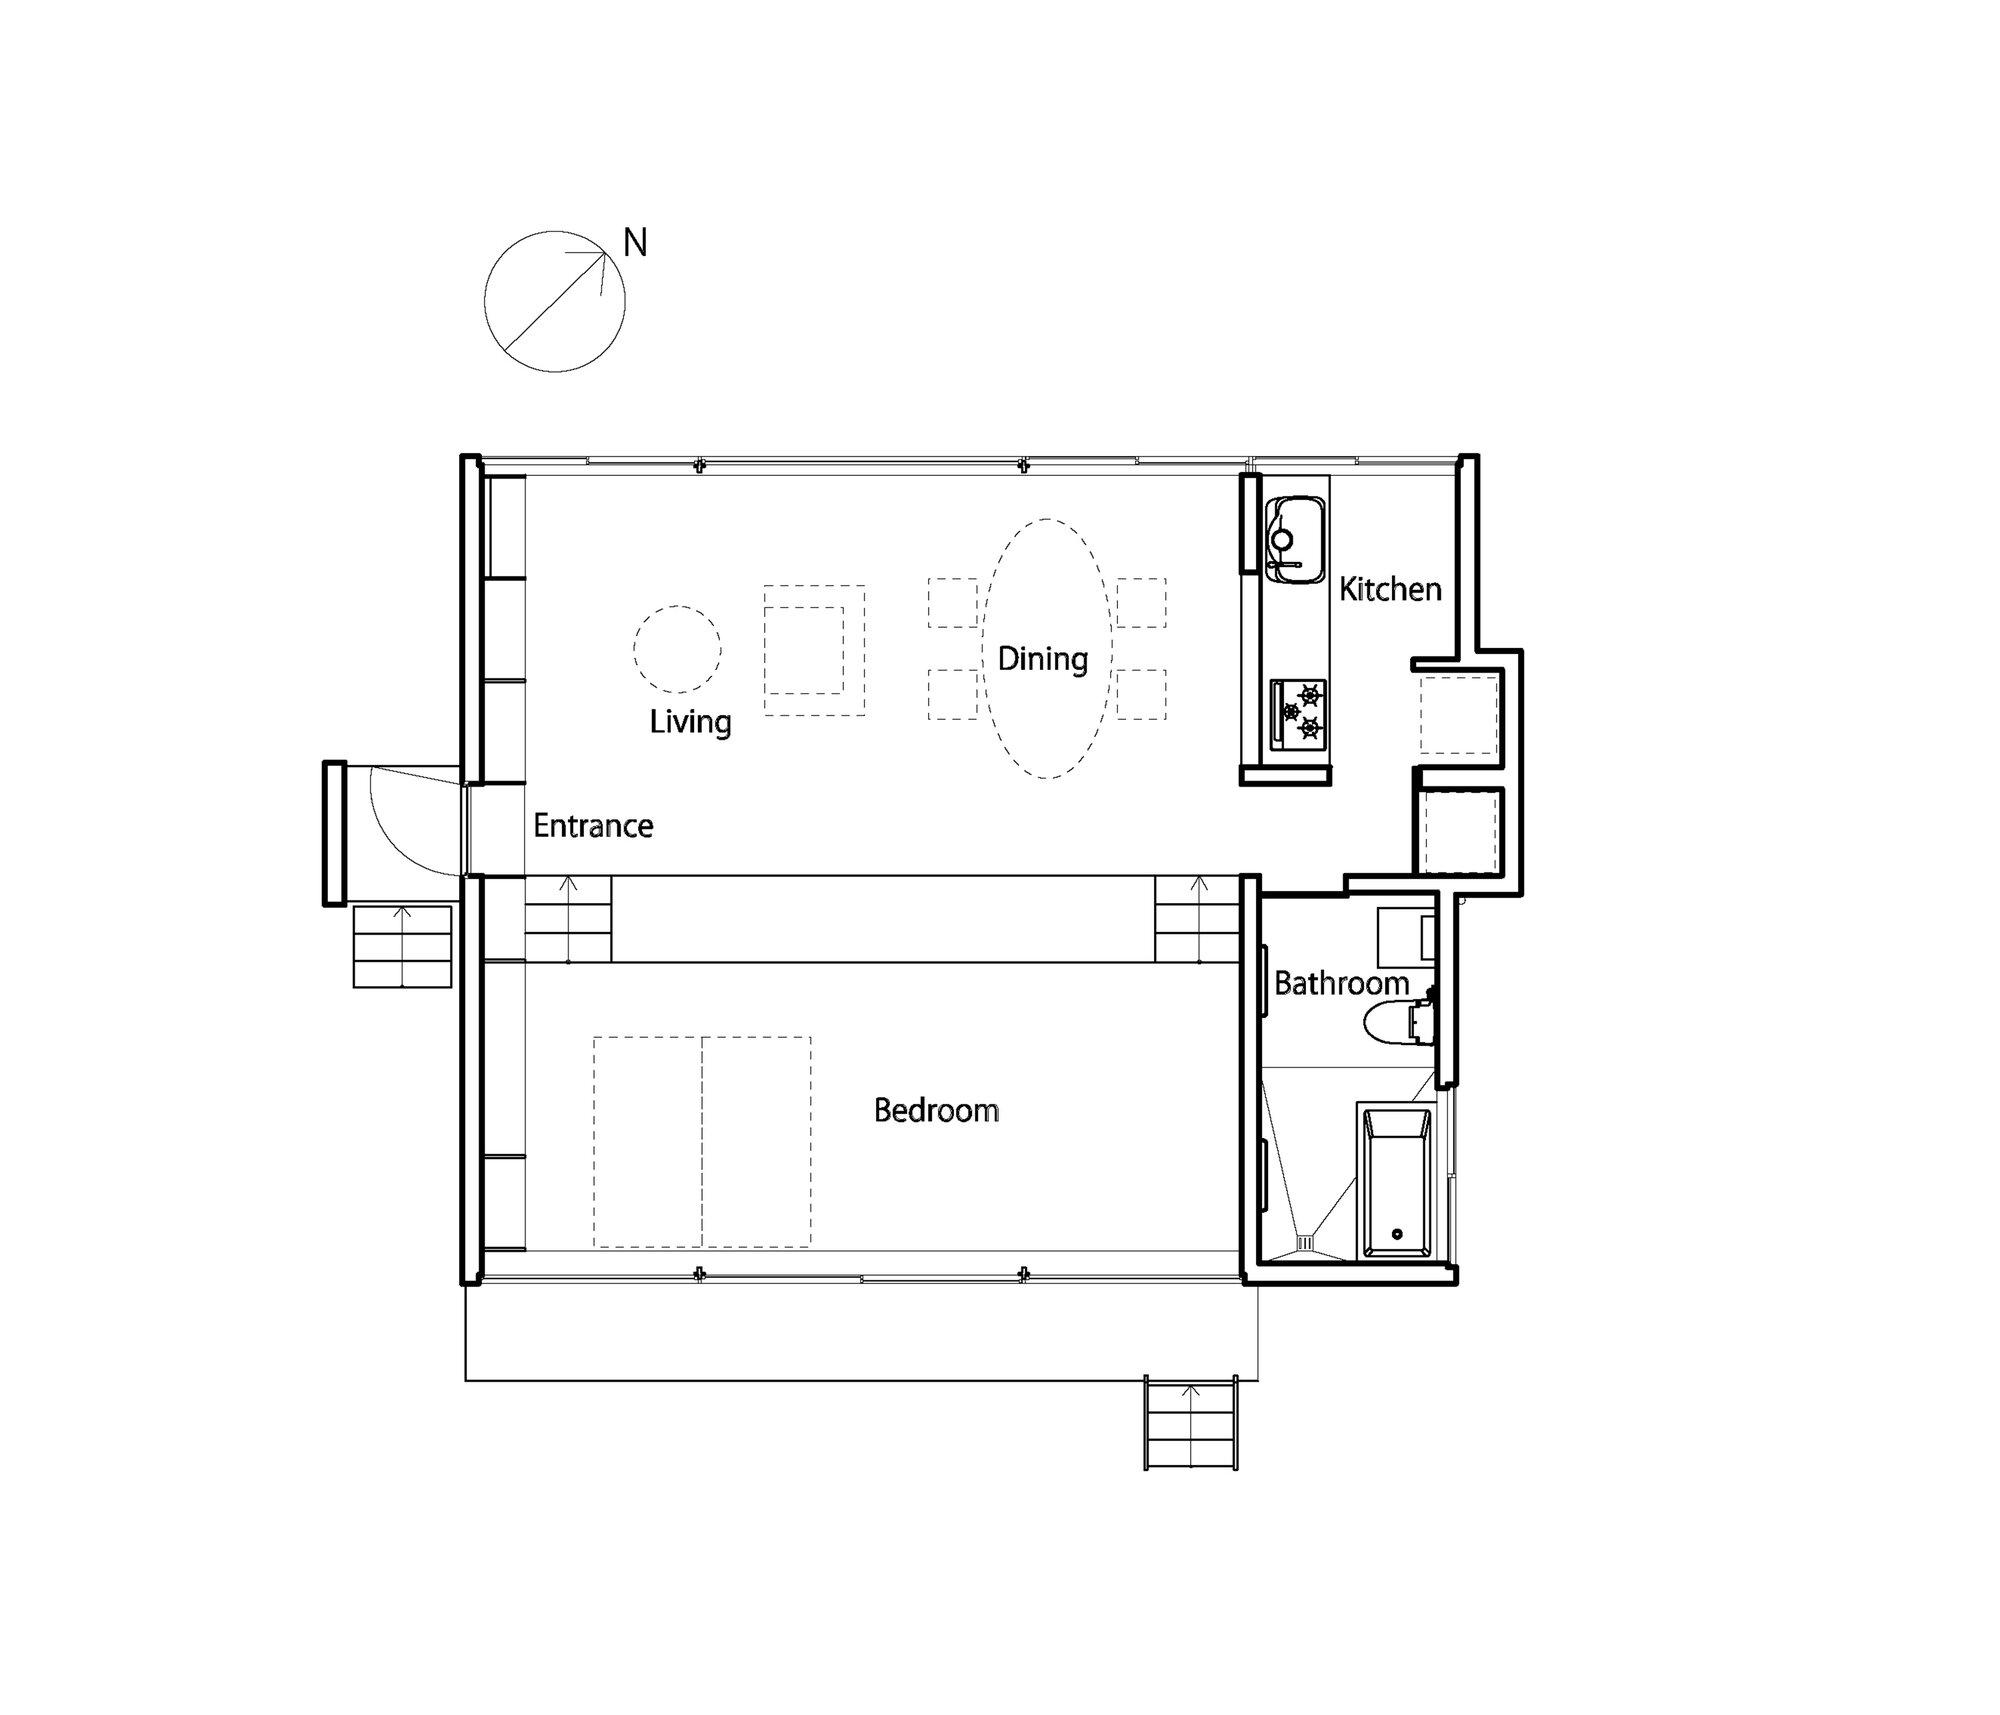 Gui House - Japanese House - Harunatsu-Arch - Shimane Japan - Floor Plan - Humble Homes